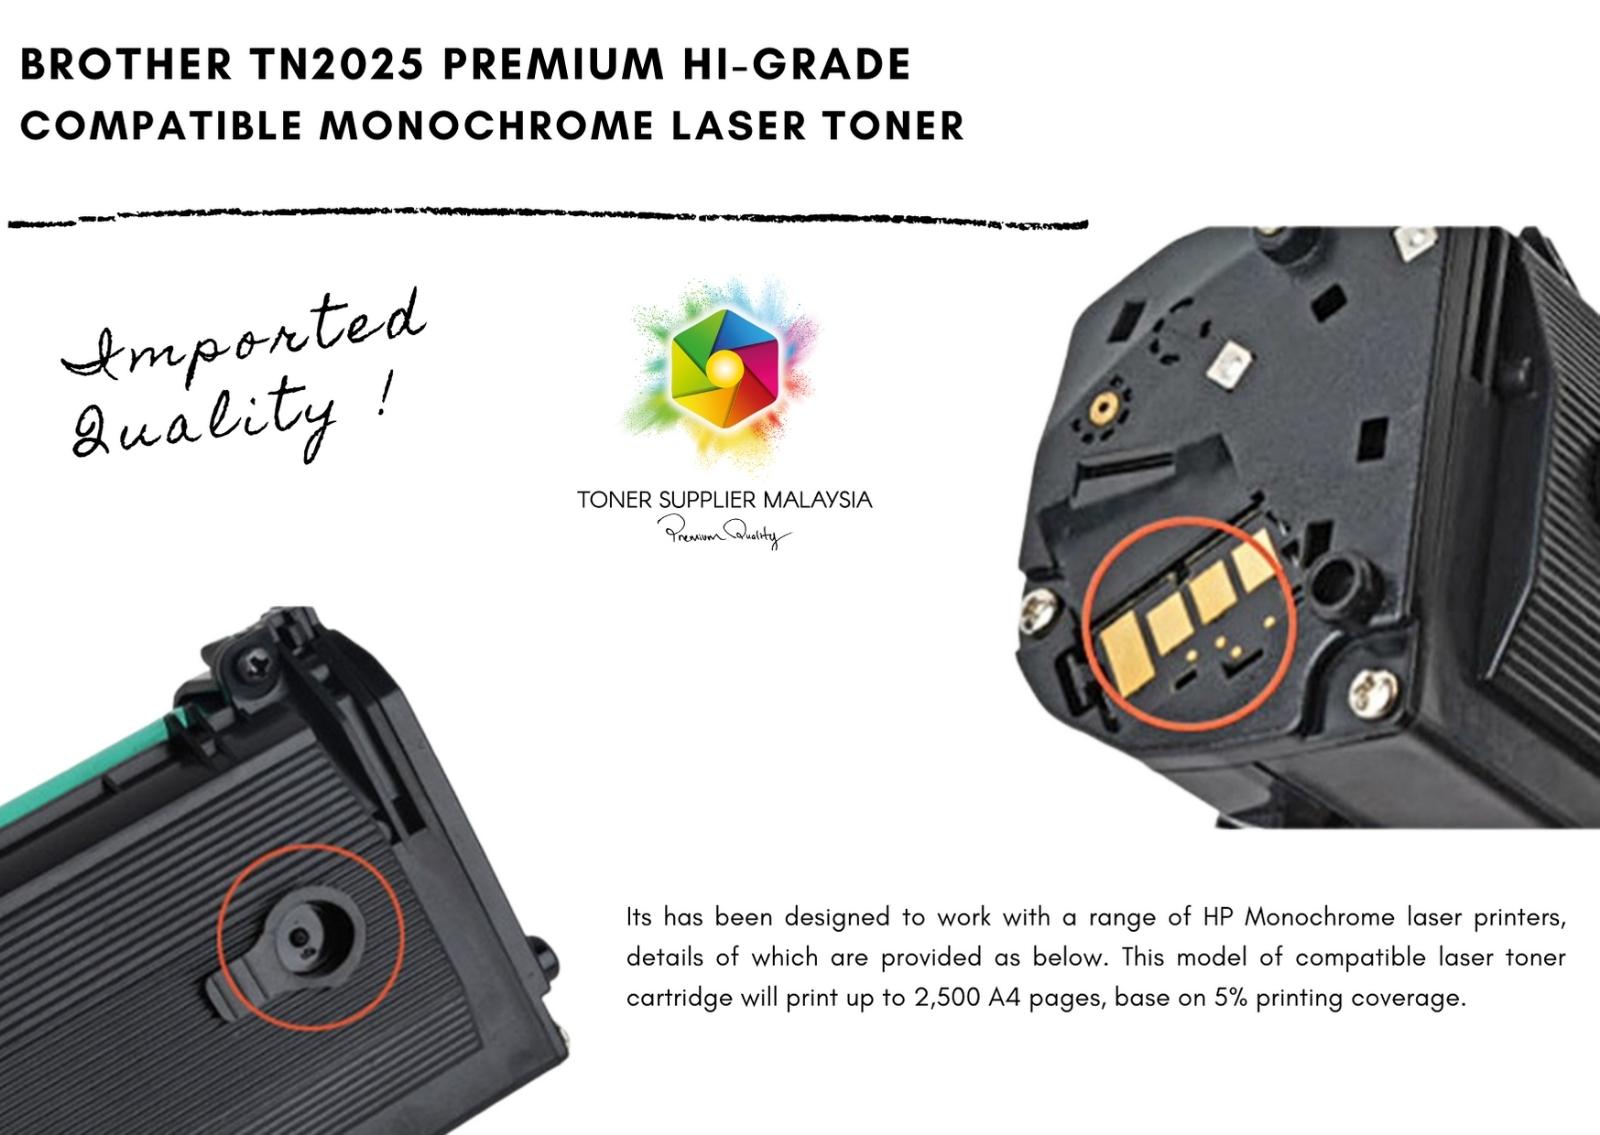 PREMIUM HI-GRADE BROTHER TN2025 COMPATILE LASER TONER